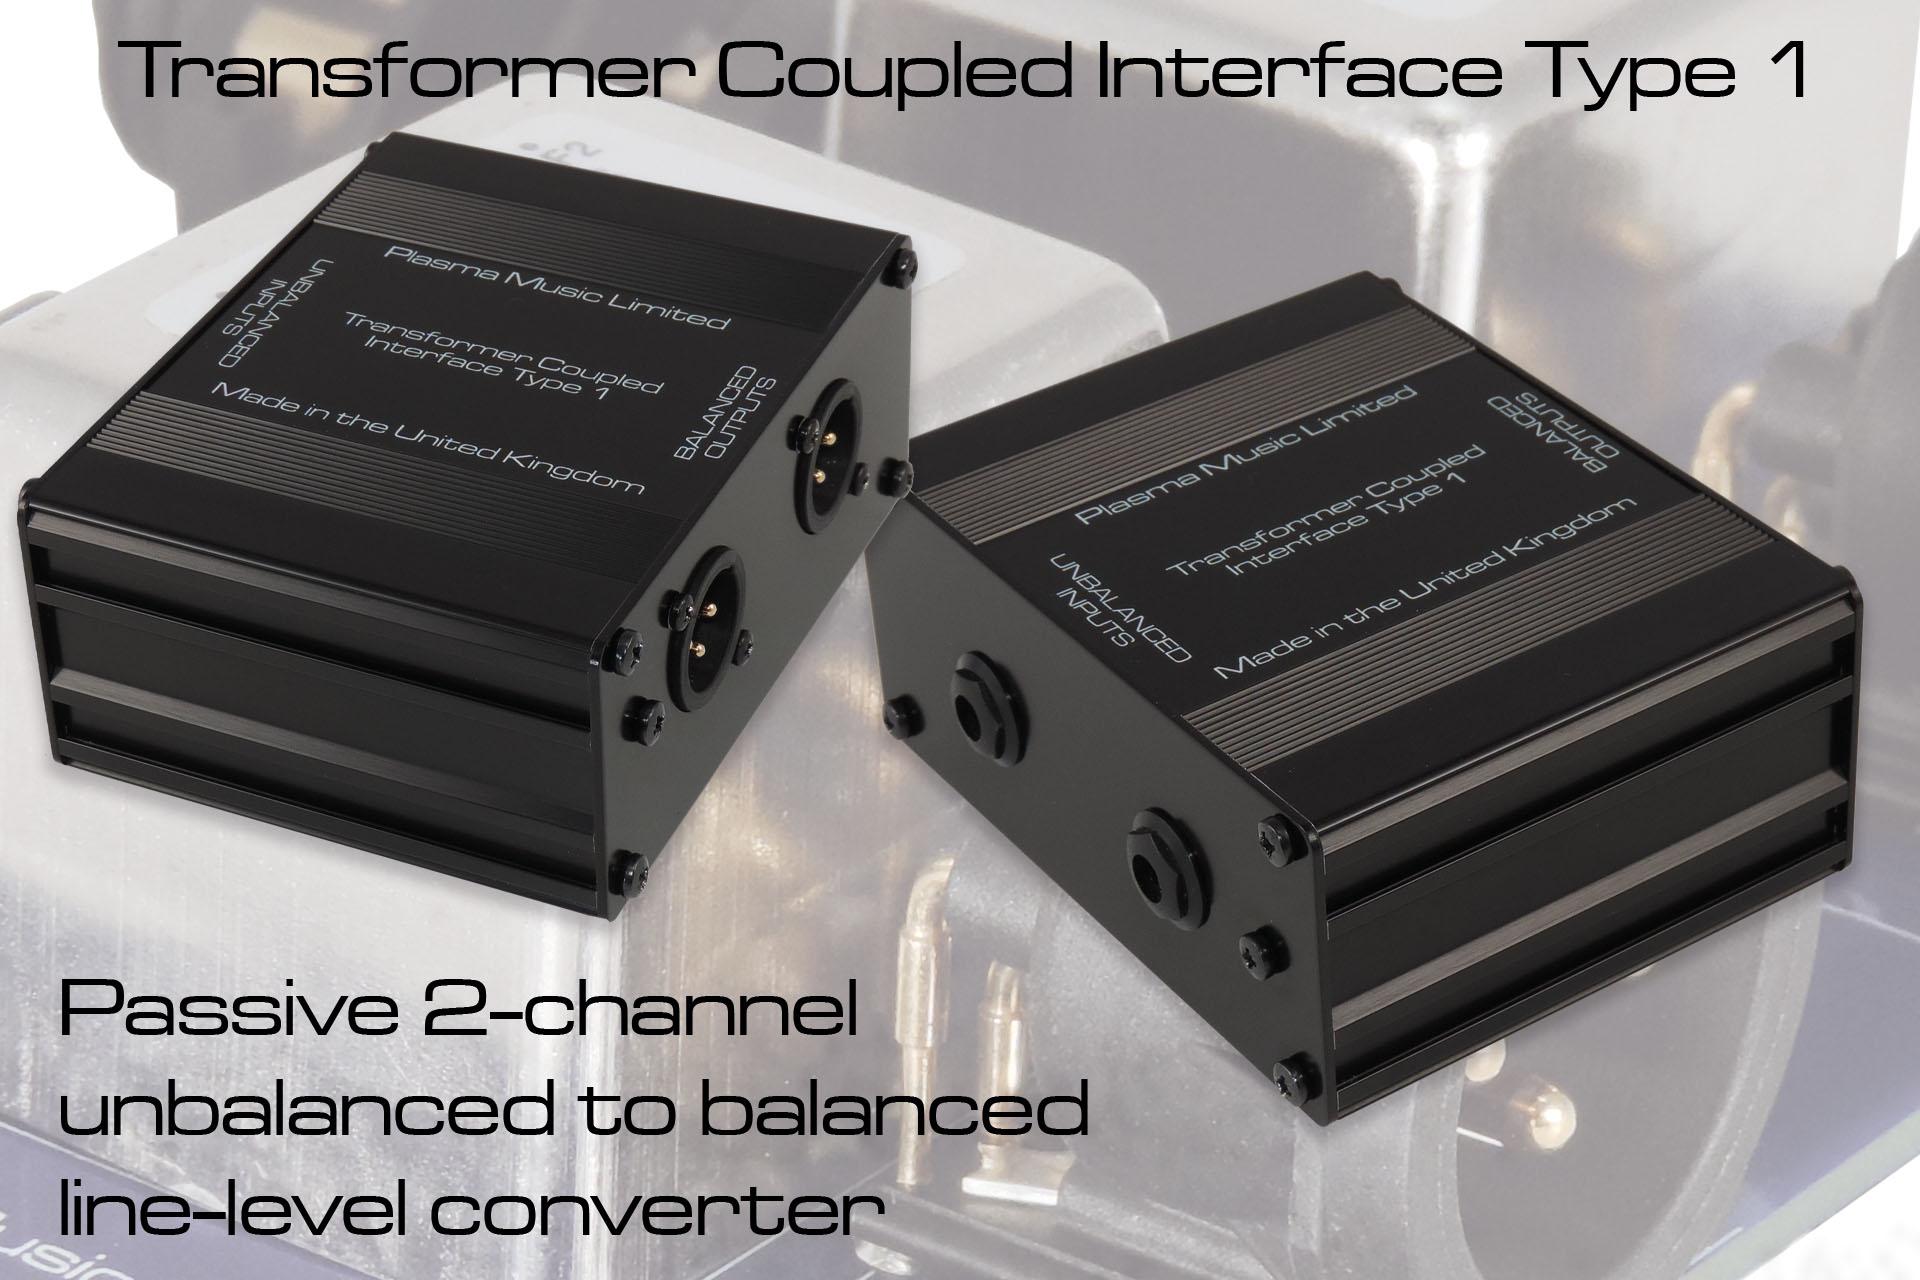 TCI Type 1 2-channel unbalanced to balanced converter